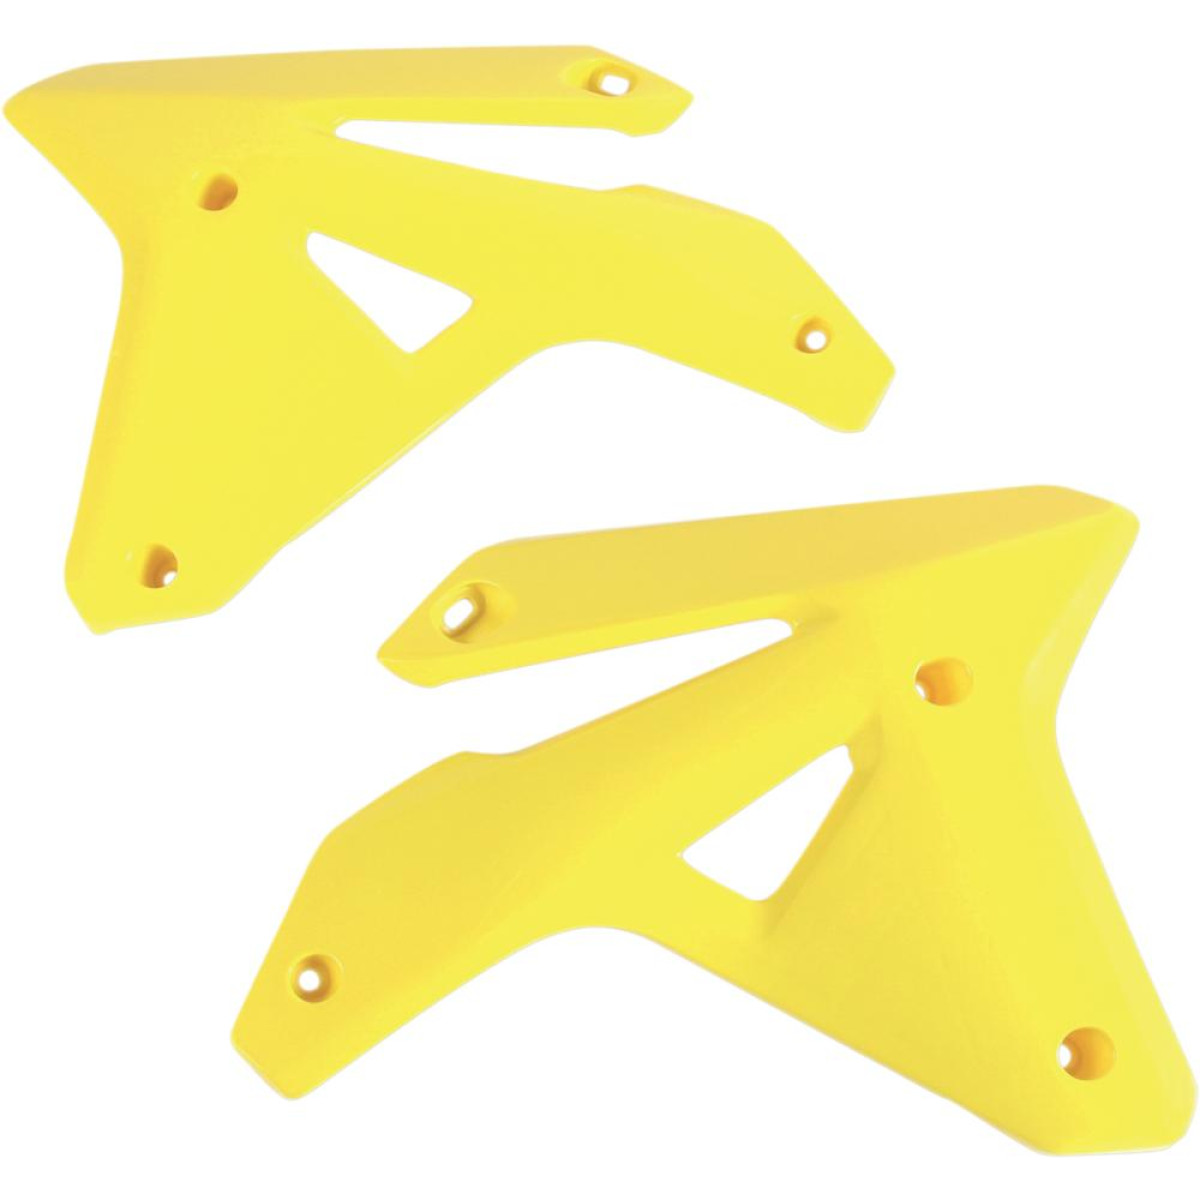 aletas tanque suzuki rmz 450 2007  amarillo ufo